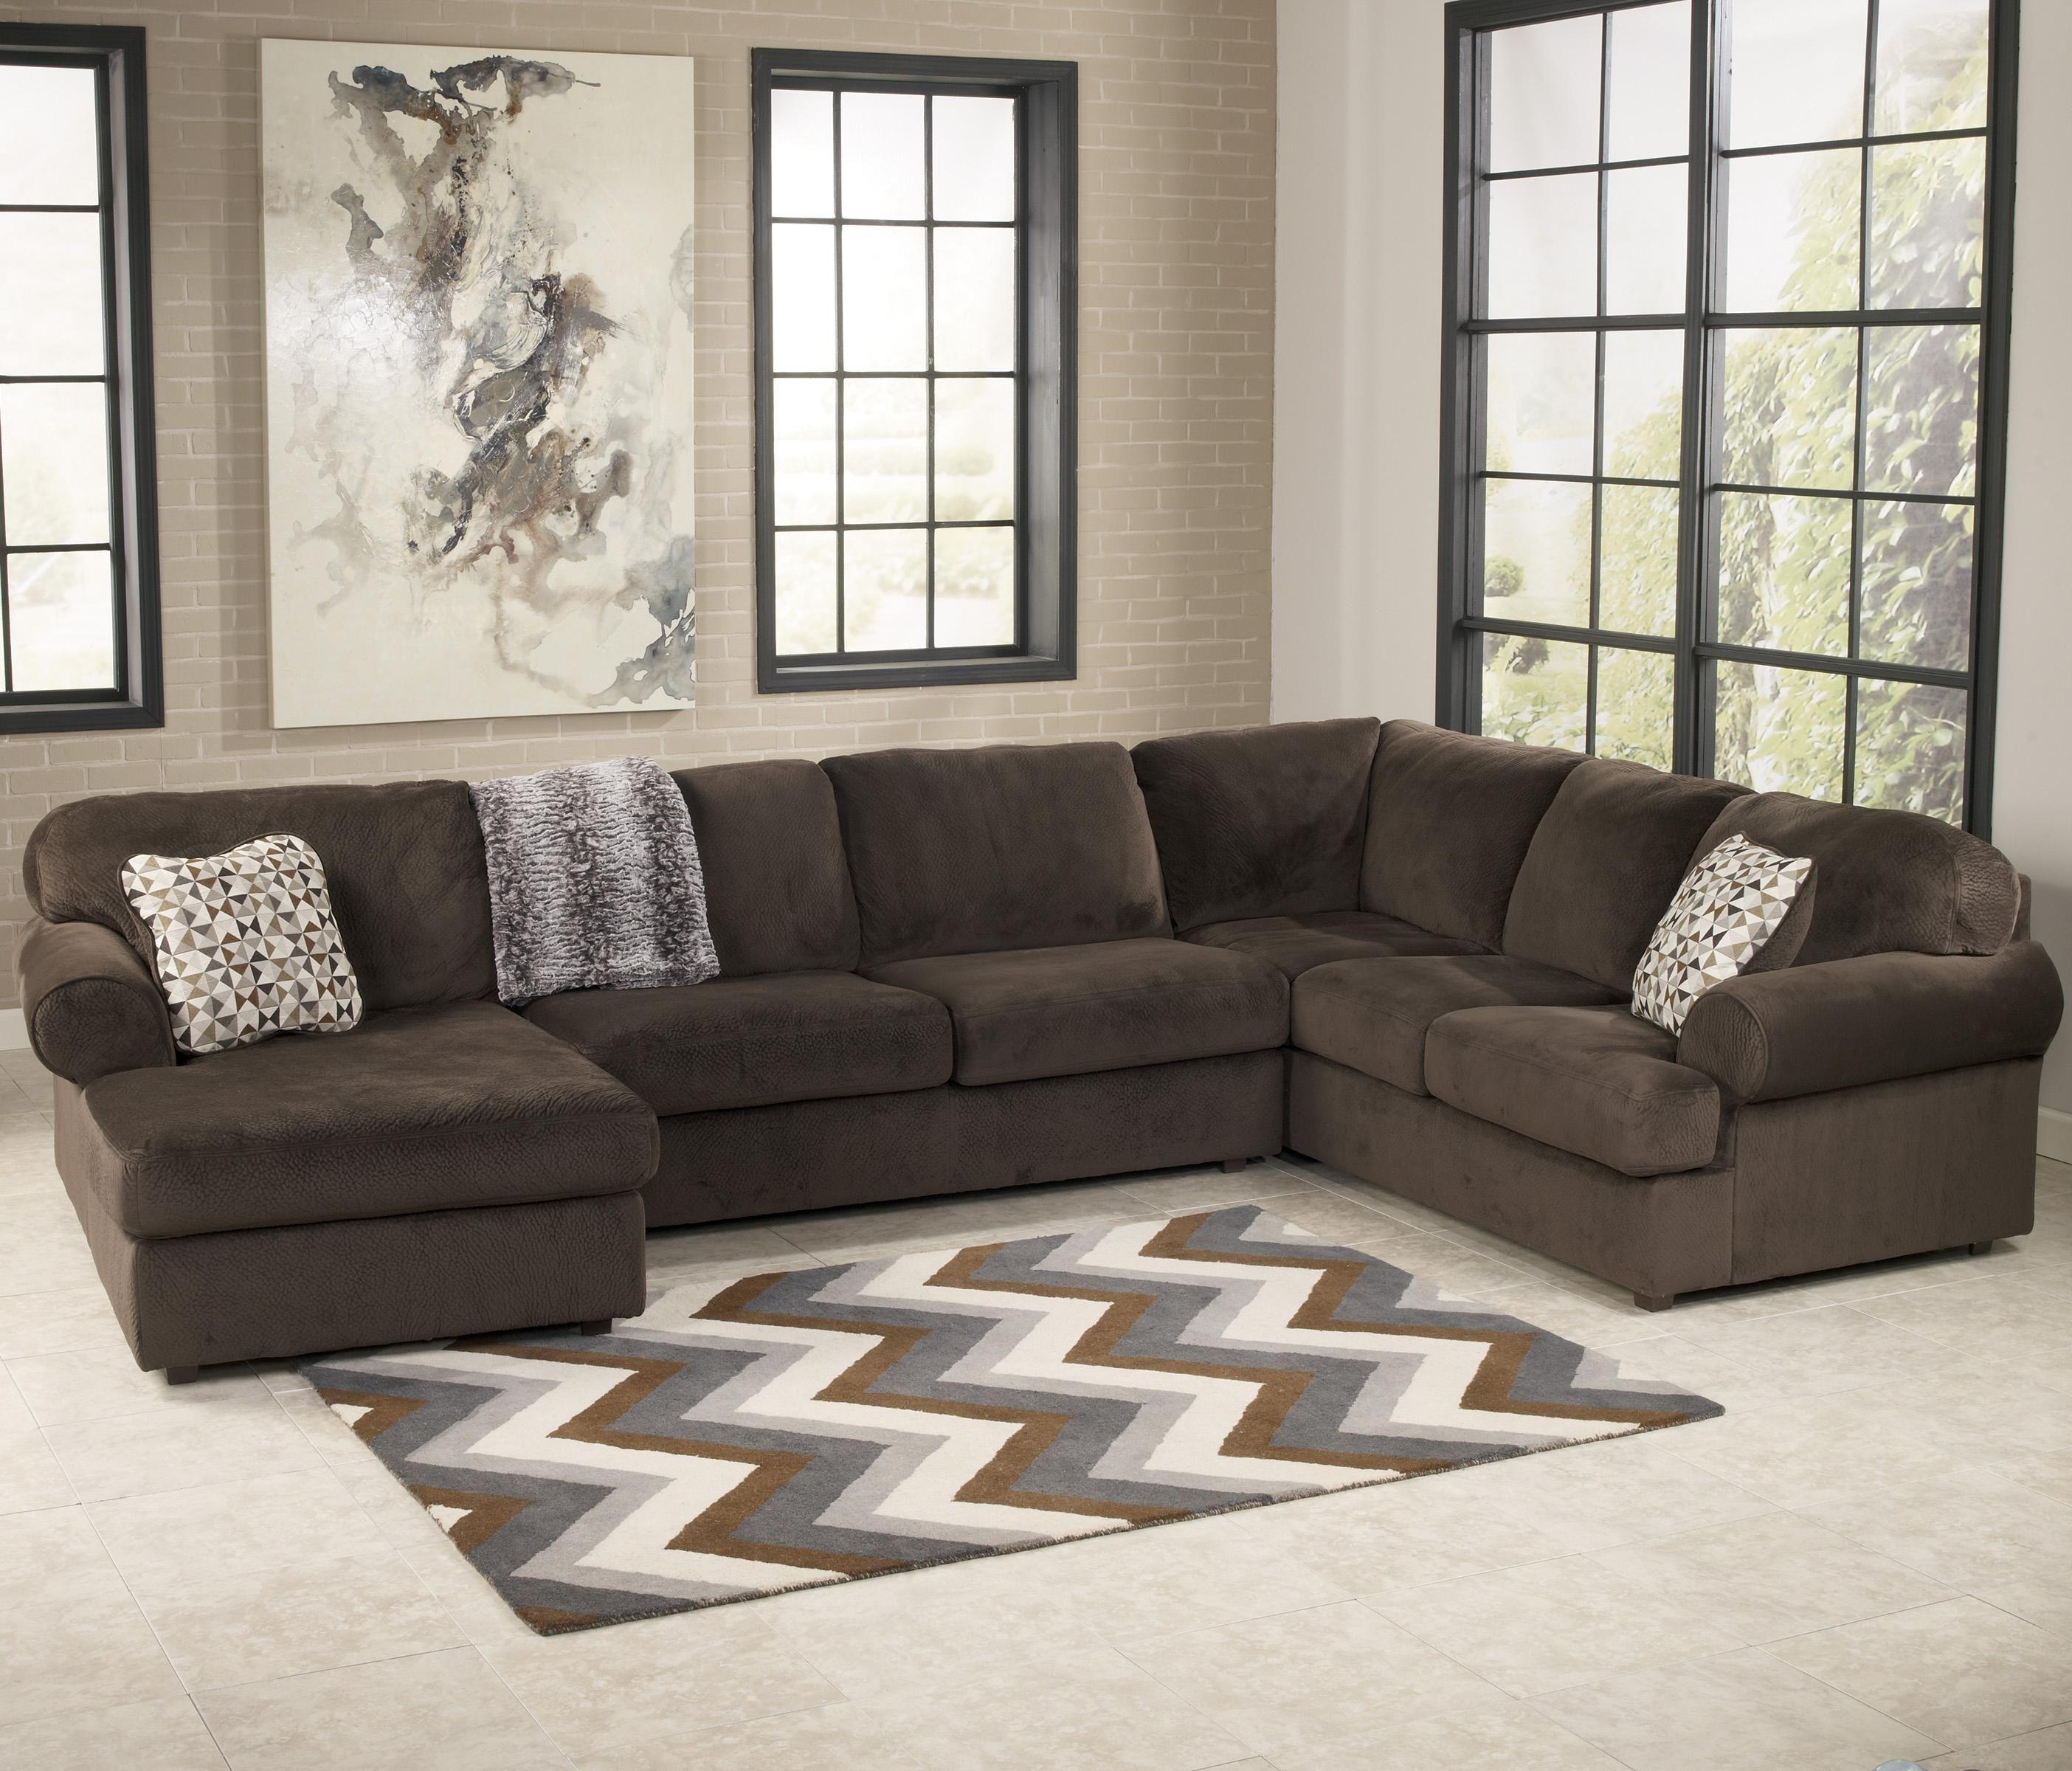 Sectional Sofas Austin Sleeper Sofa Tx Texas Leather Stock Photos Hd For Sectional Sofas At Austin (View 9 of 10)